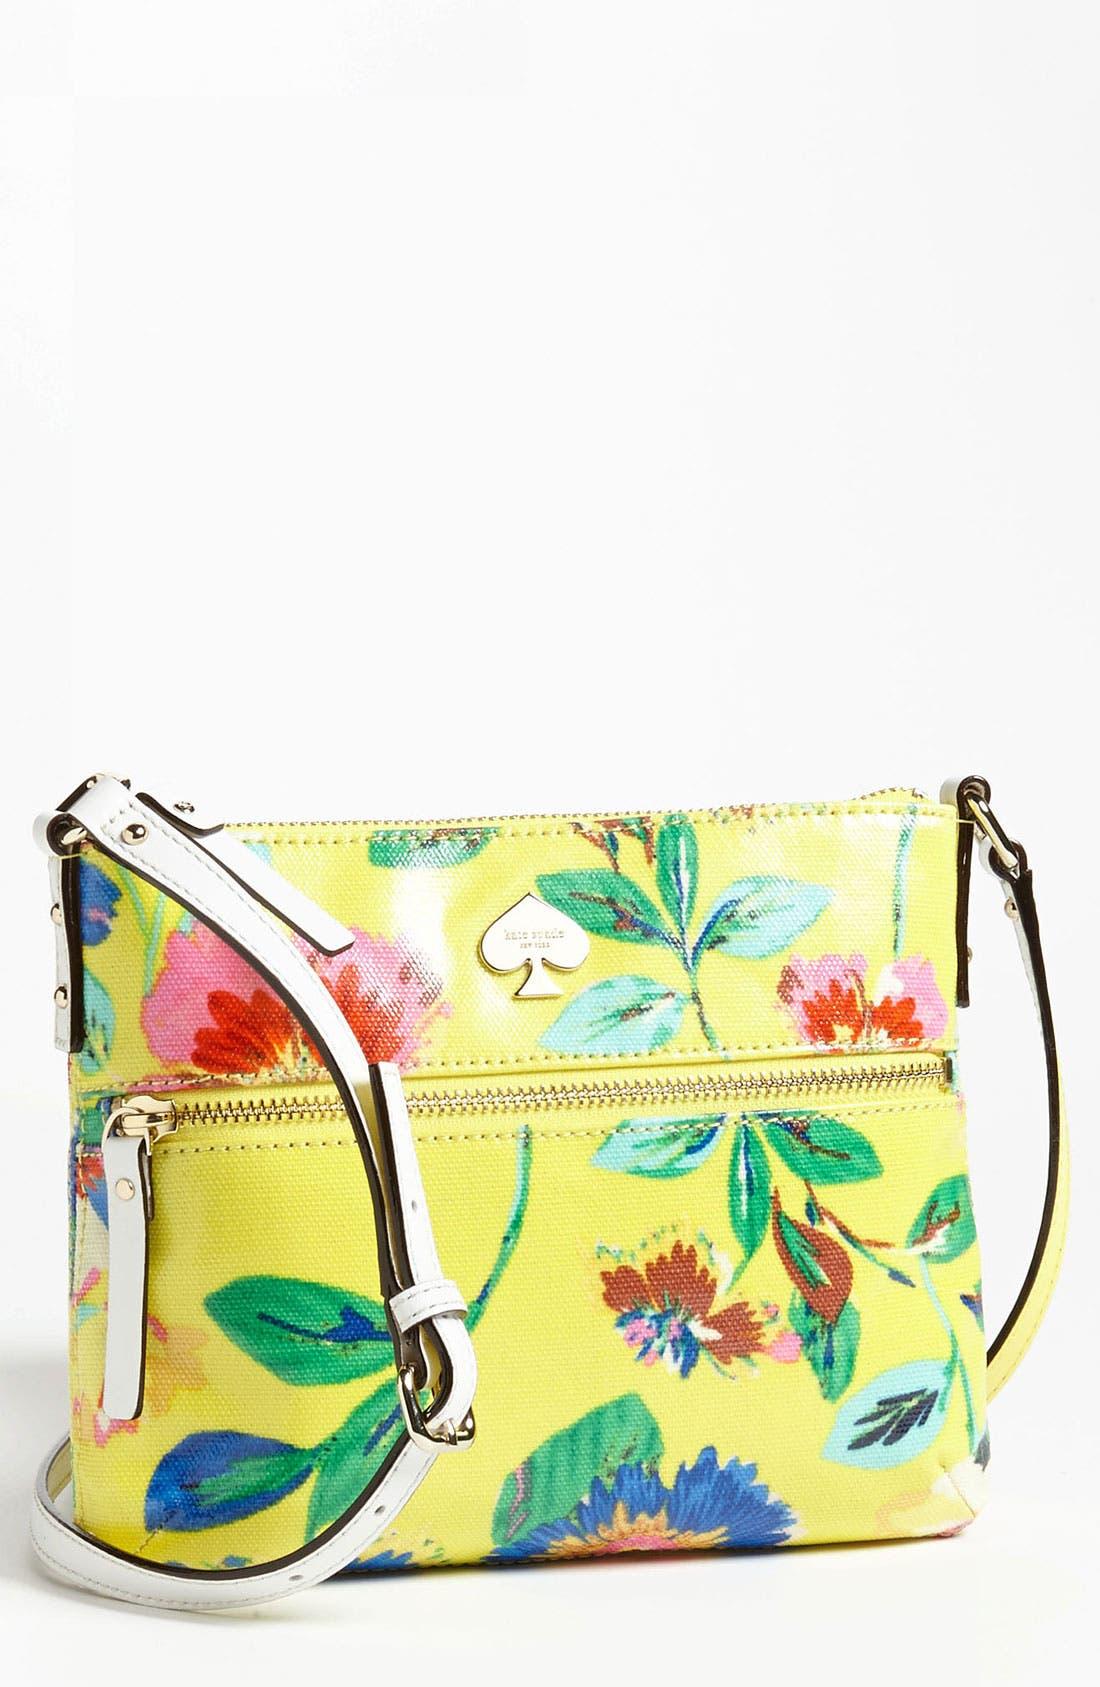 Alternate Image 1 Selected - kate spade new york 'flicker - tenley' crossbody bag